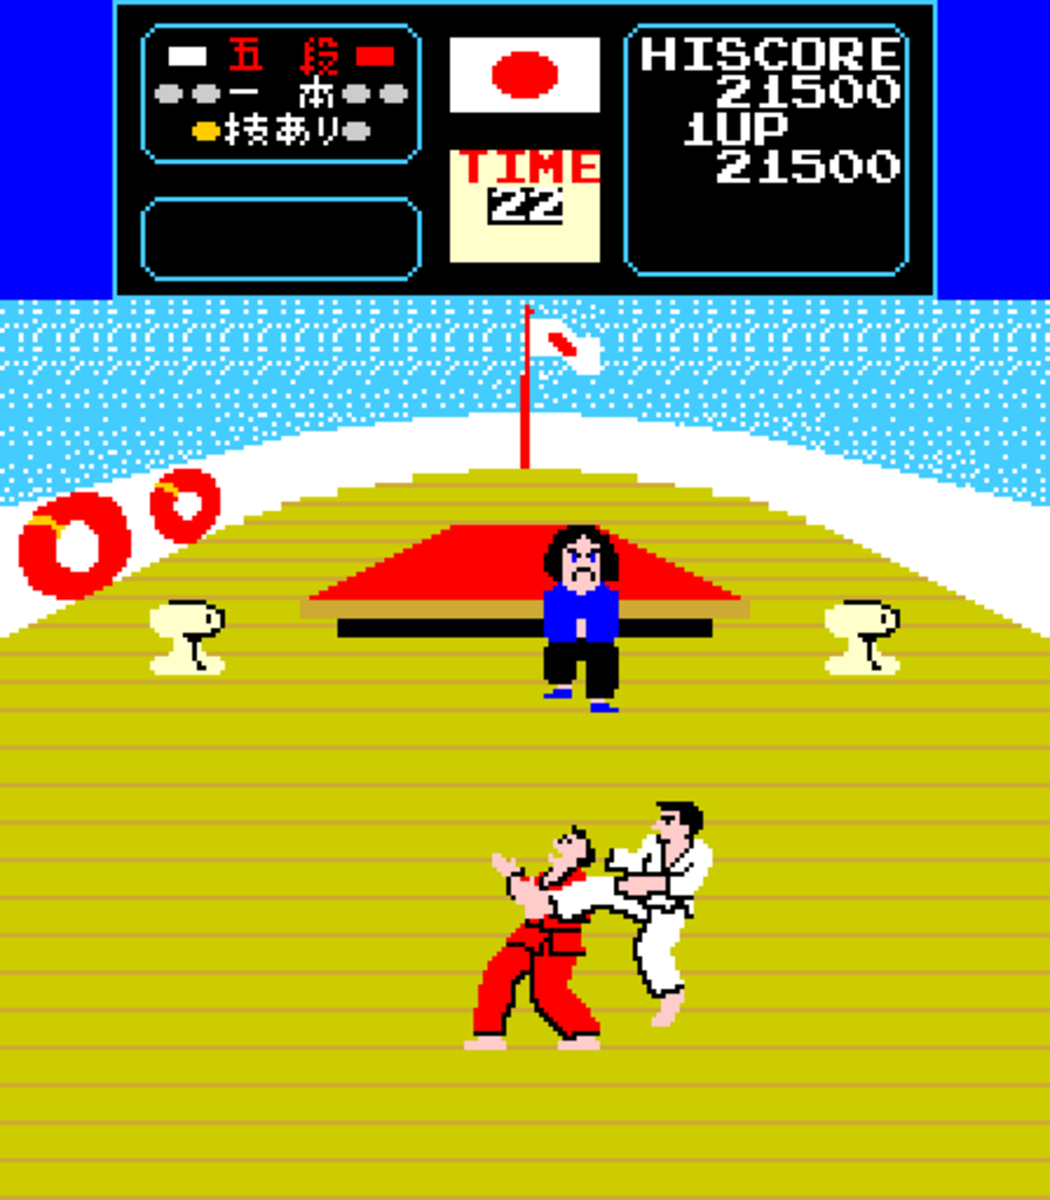 Ooohh I bet that hurt... Karate Champ